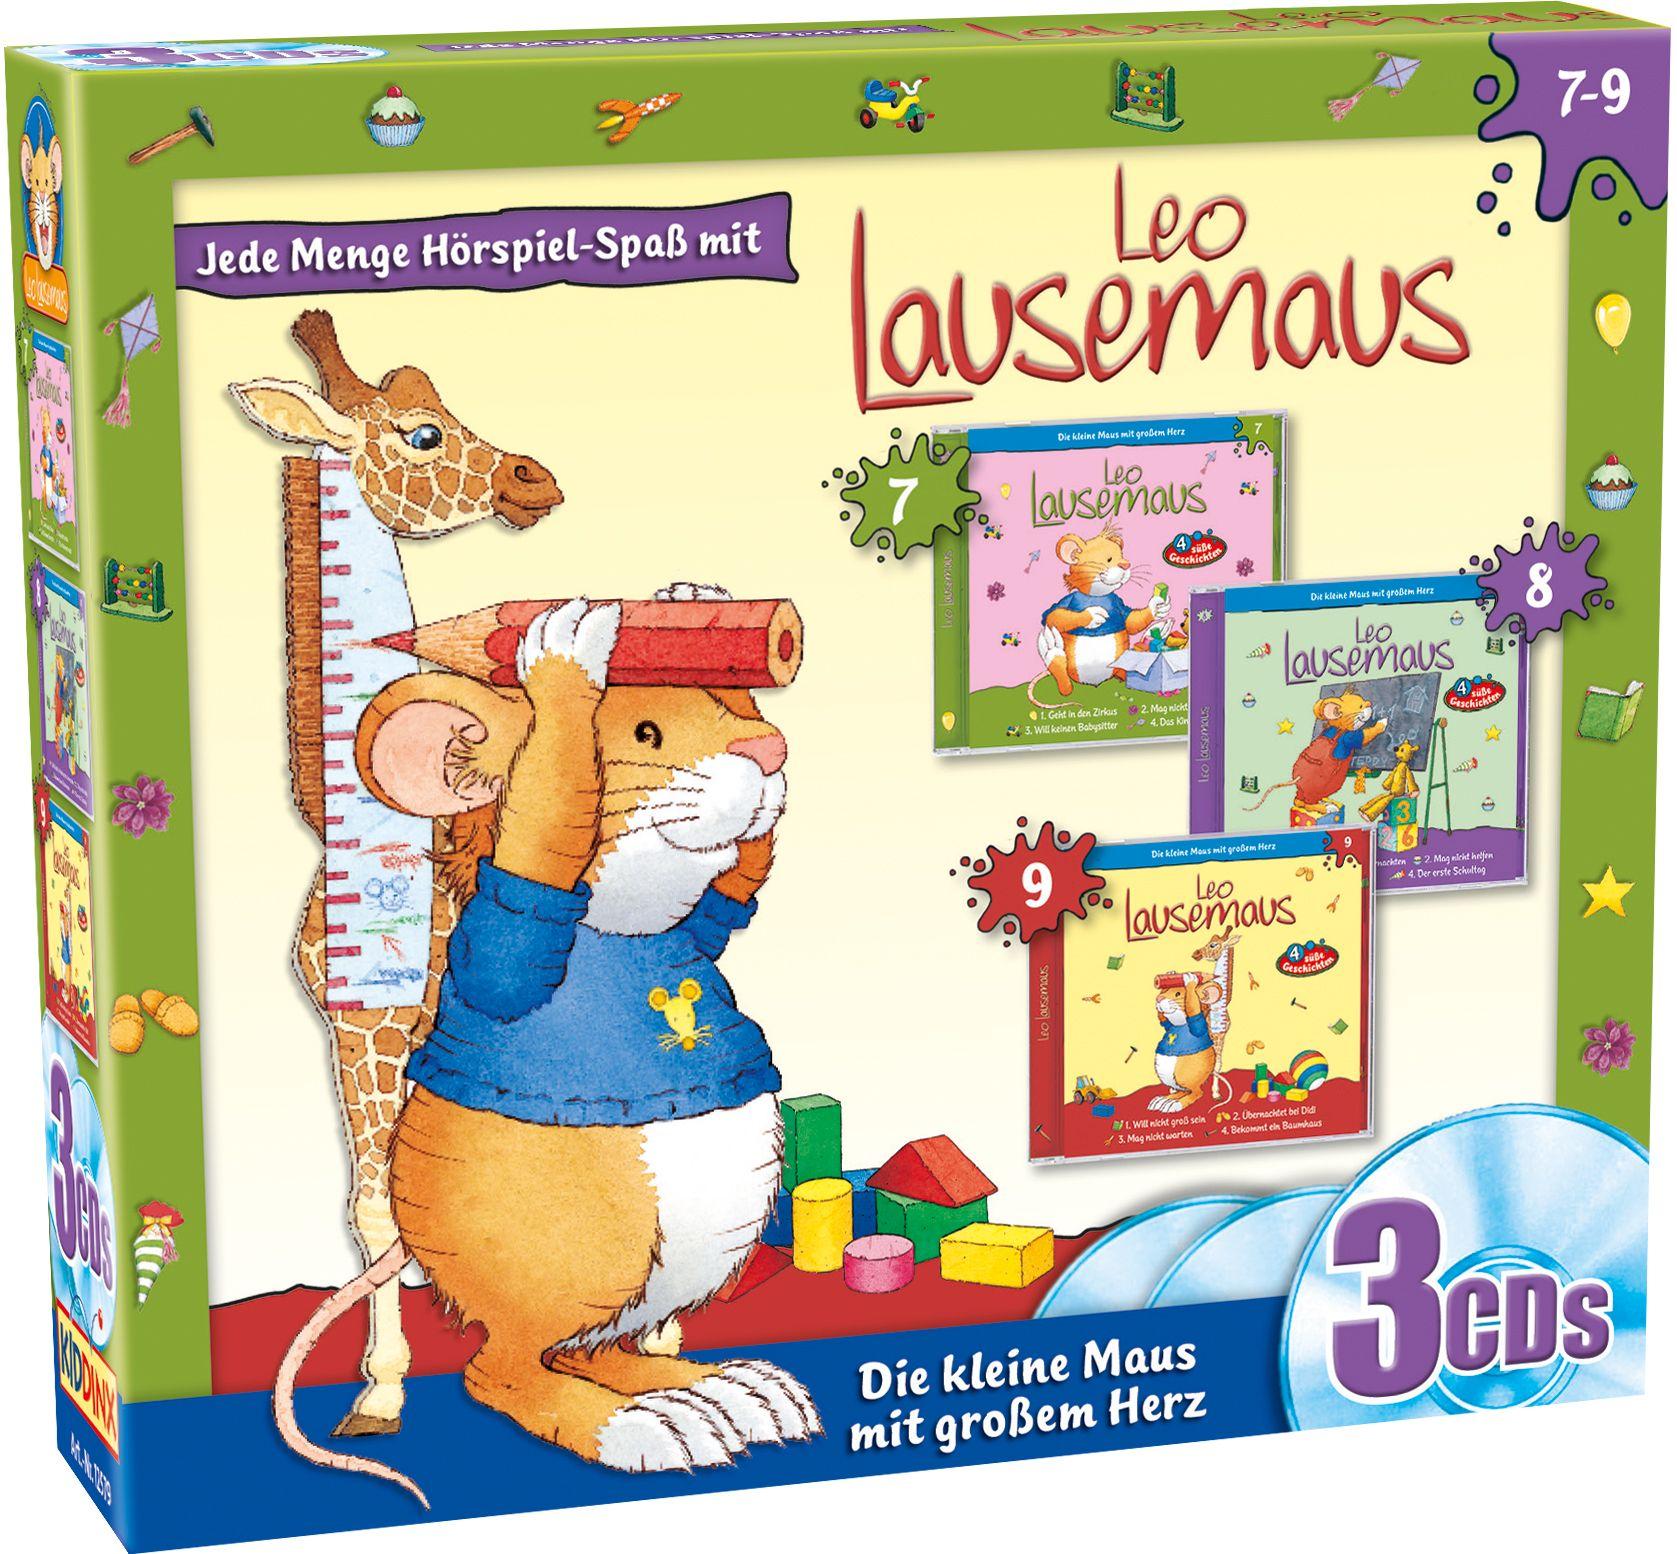 Leo Lausemaus 3er Box (Folge 7 – 9)